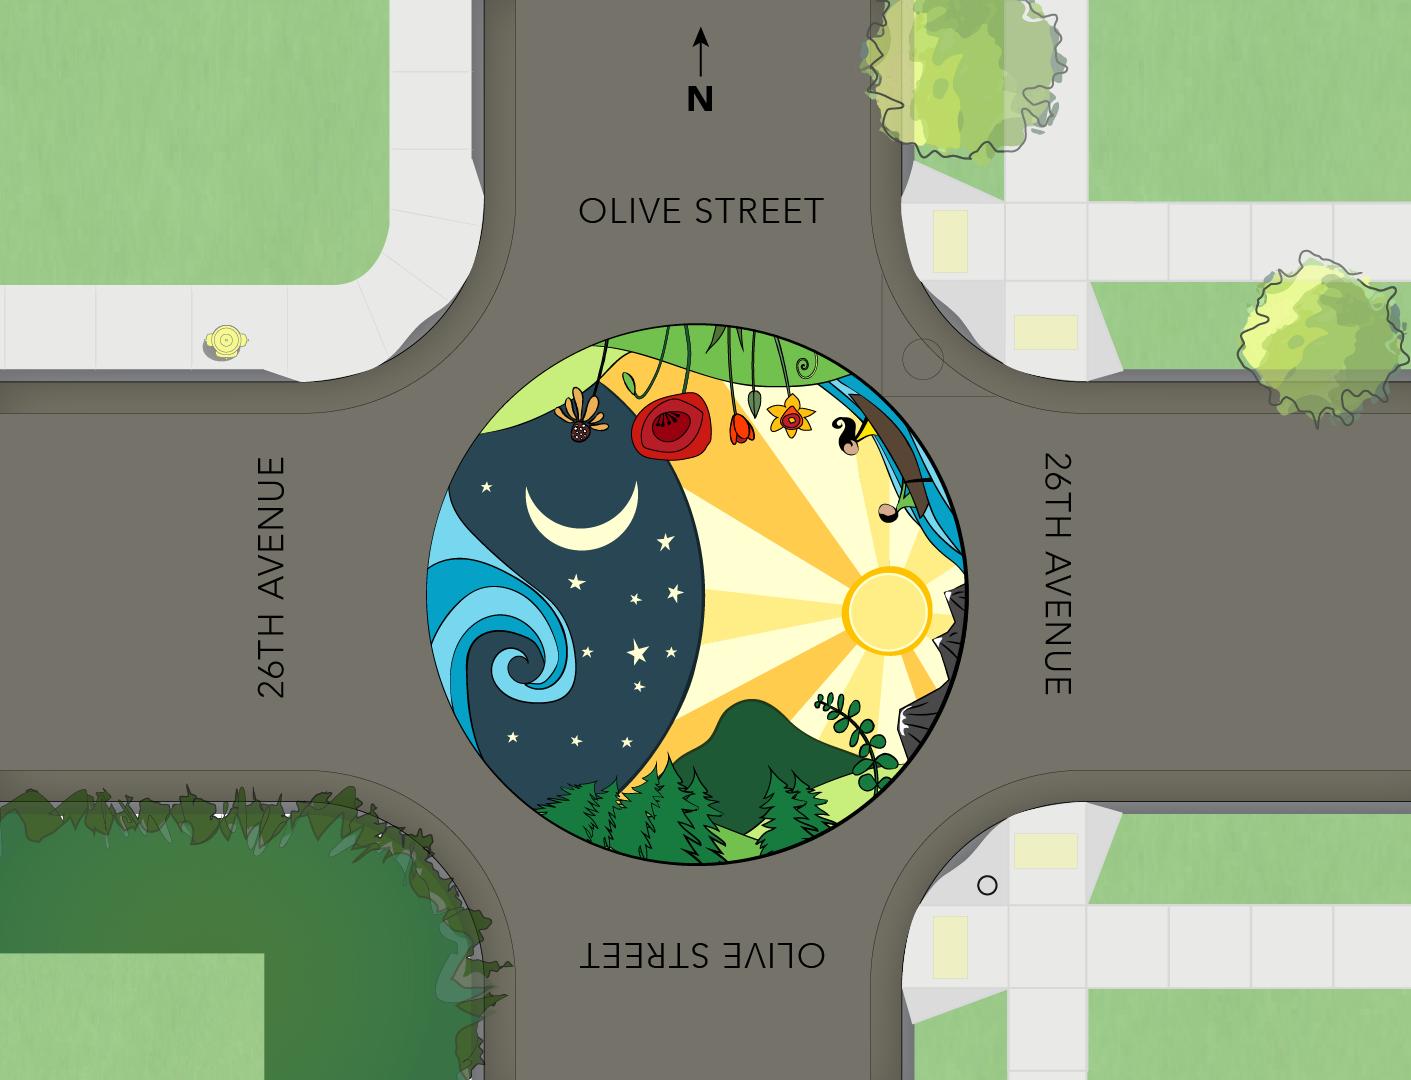 SW Oregon Architect: Tactical Urbanism: 26th & Olive